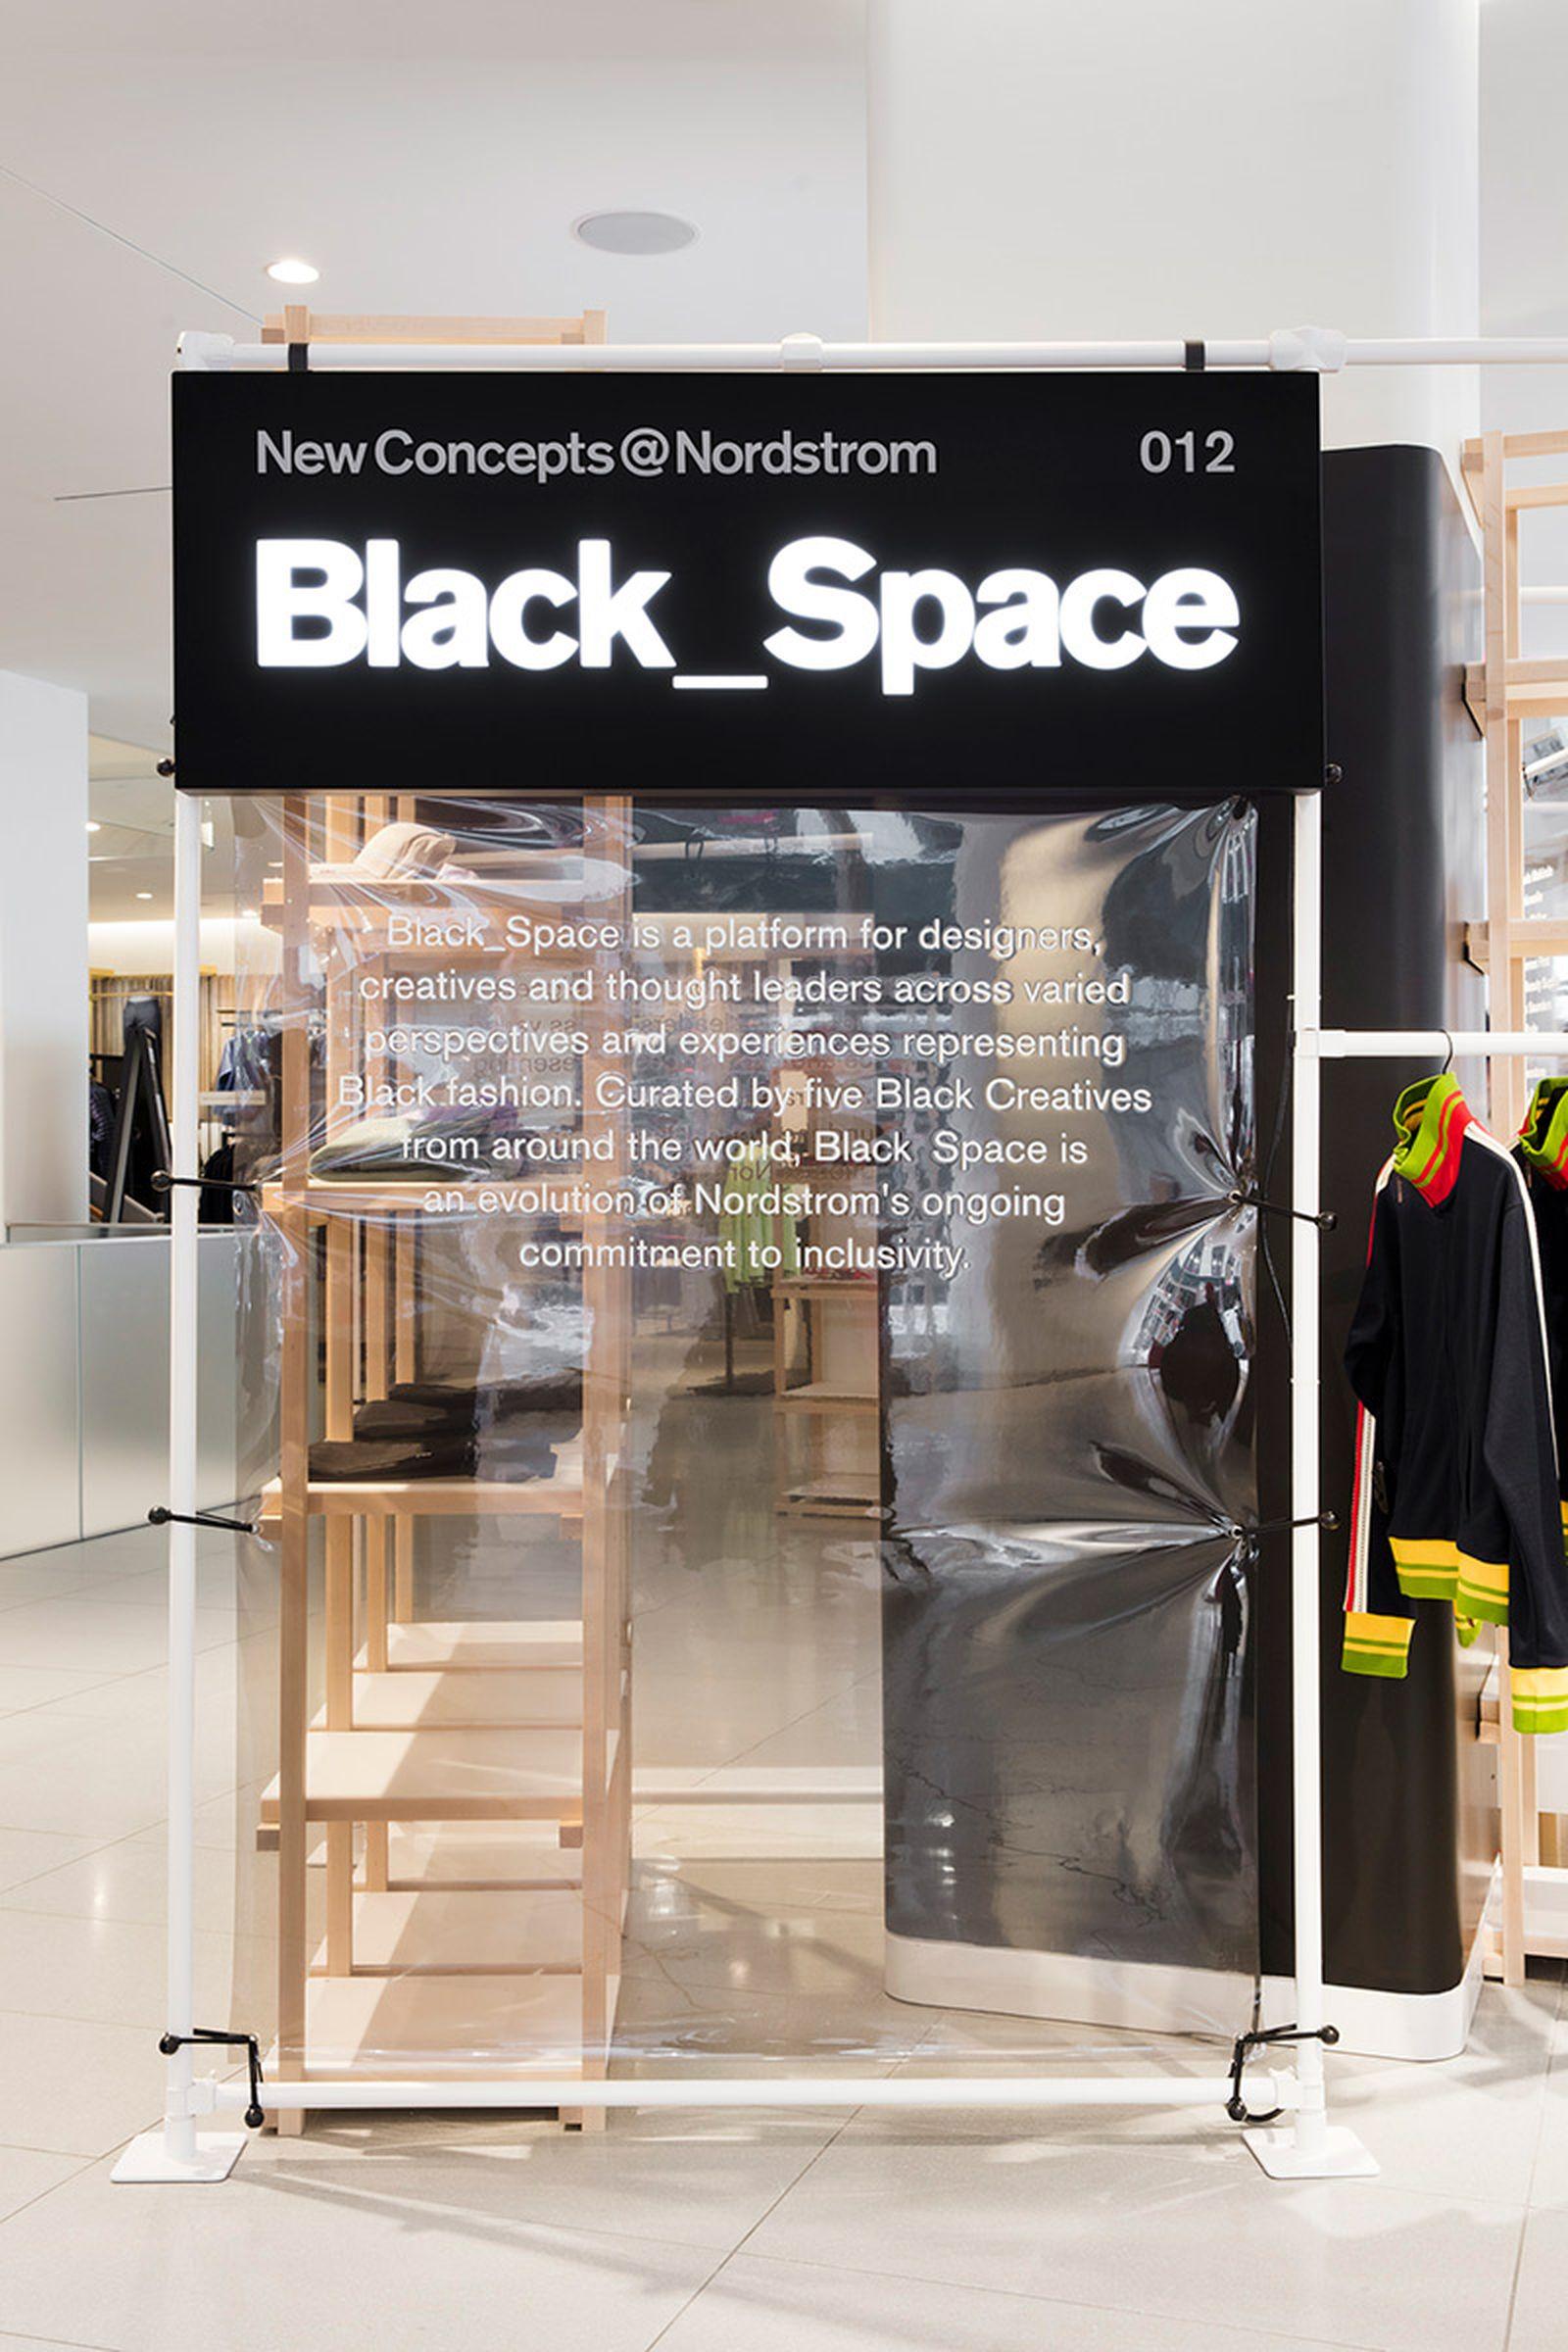 nordstrom-concept-012-black-space-08